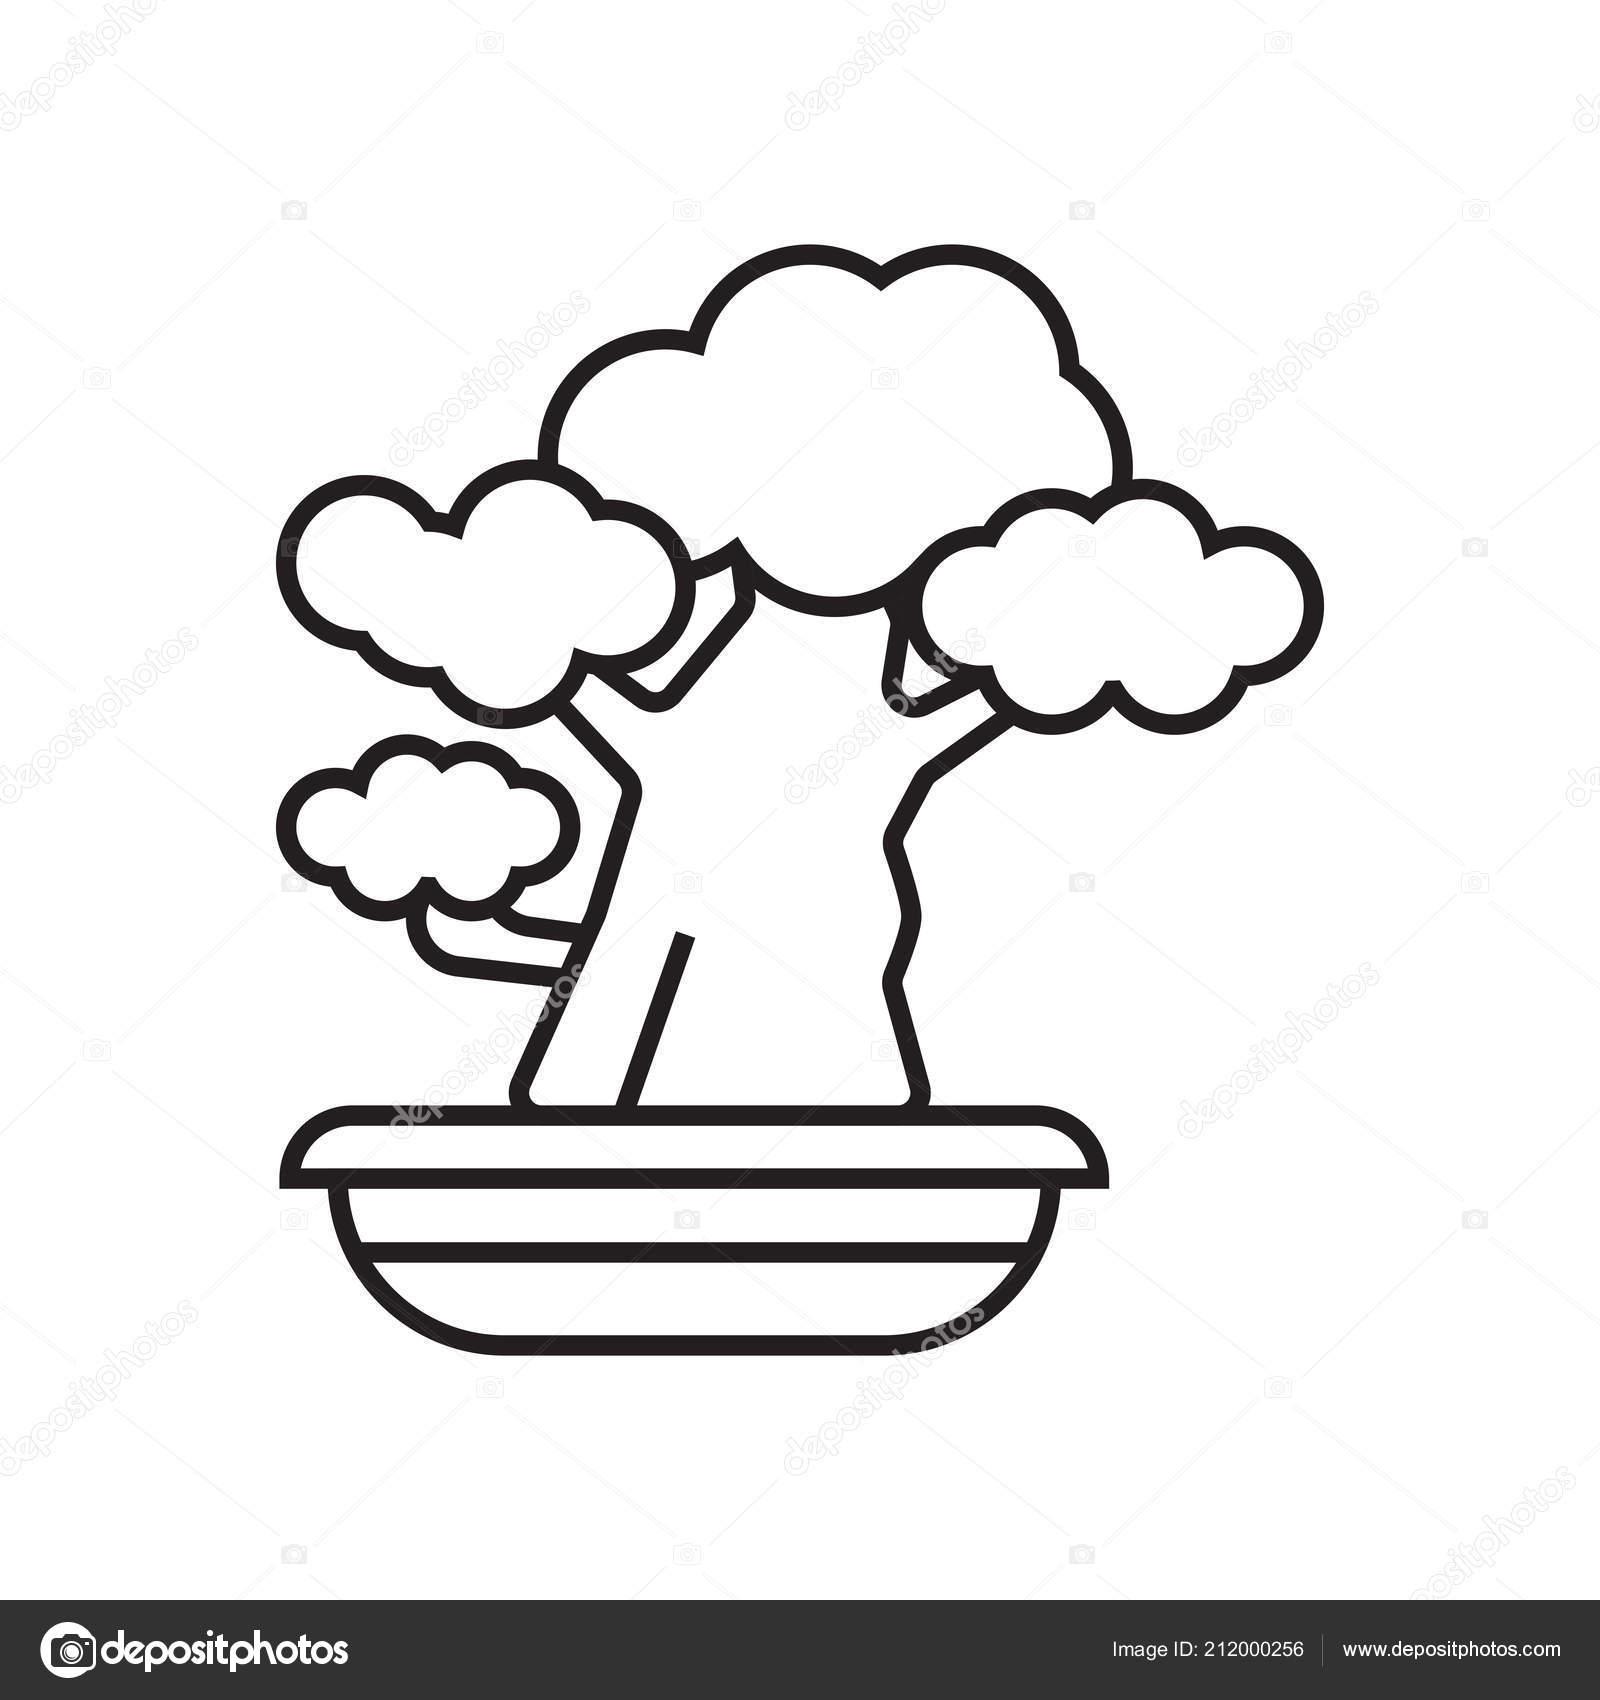 bonsai stock vectors royalty free bonsai illustrations